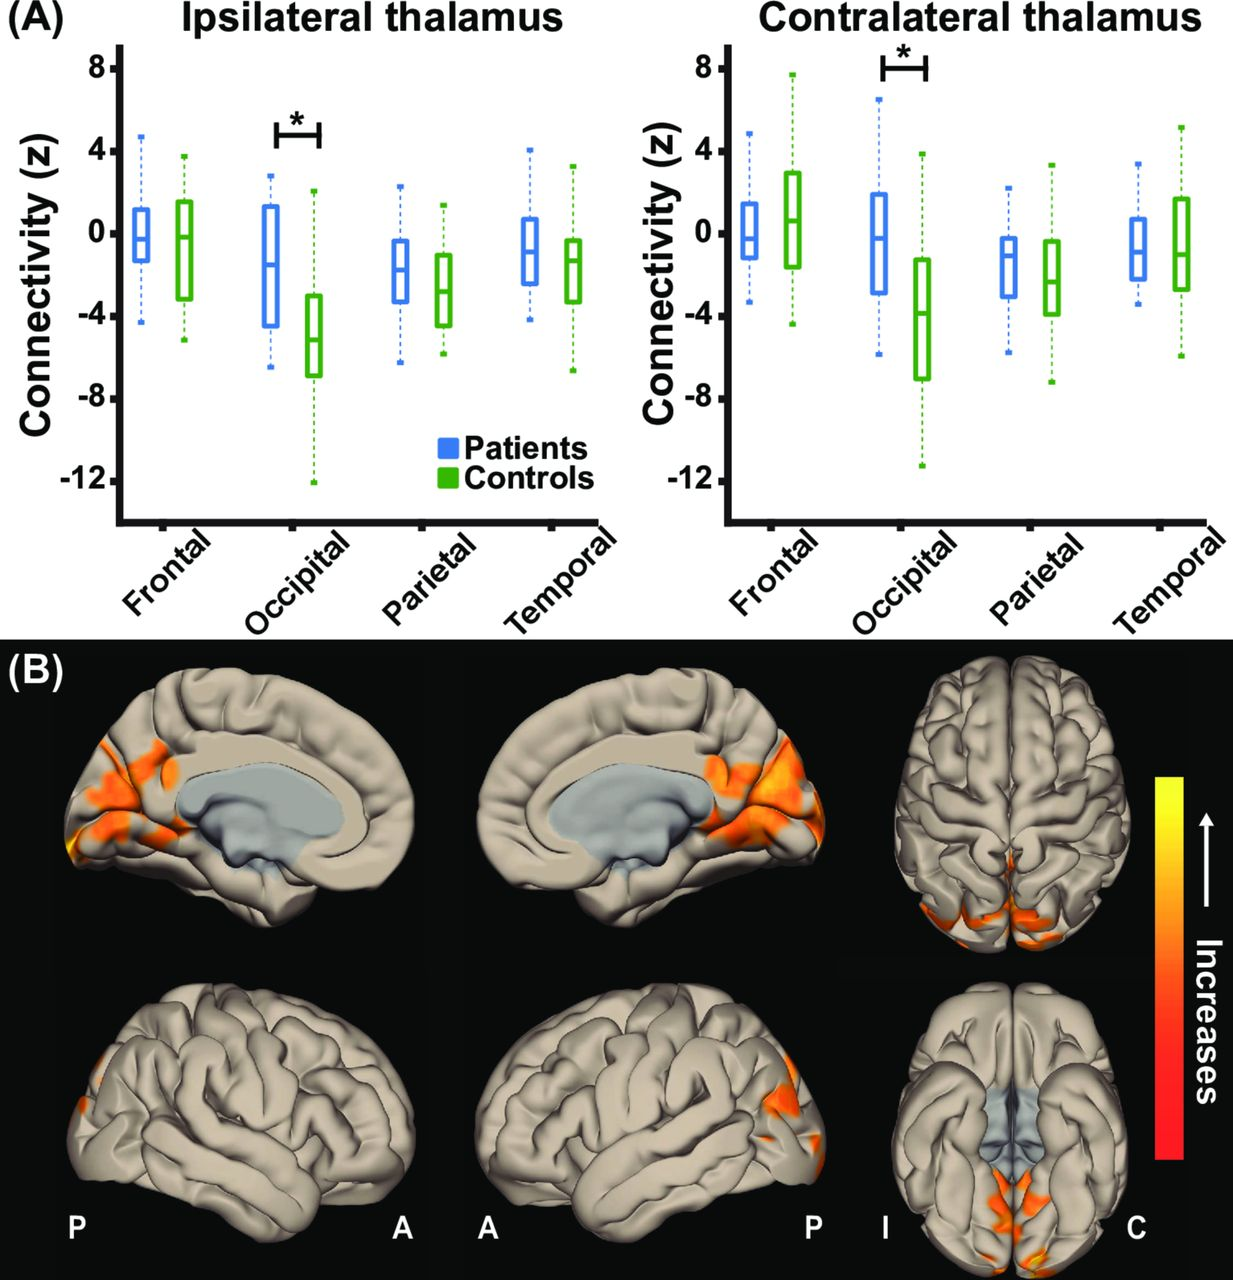 Thalamic arousal network disturbances in temporal lobe epilepsy and